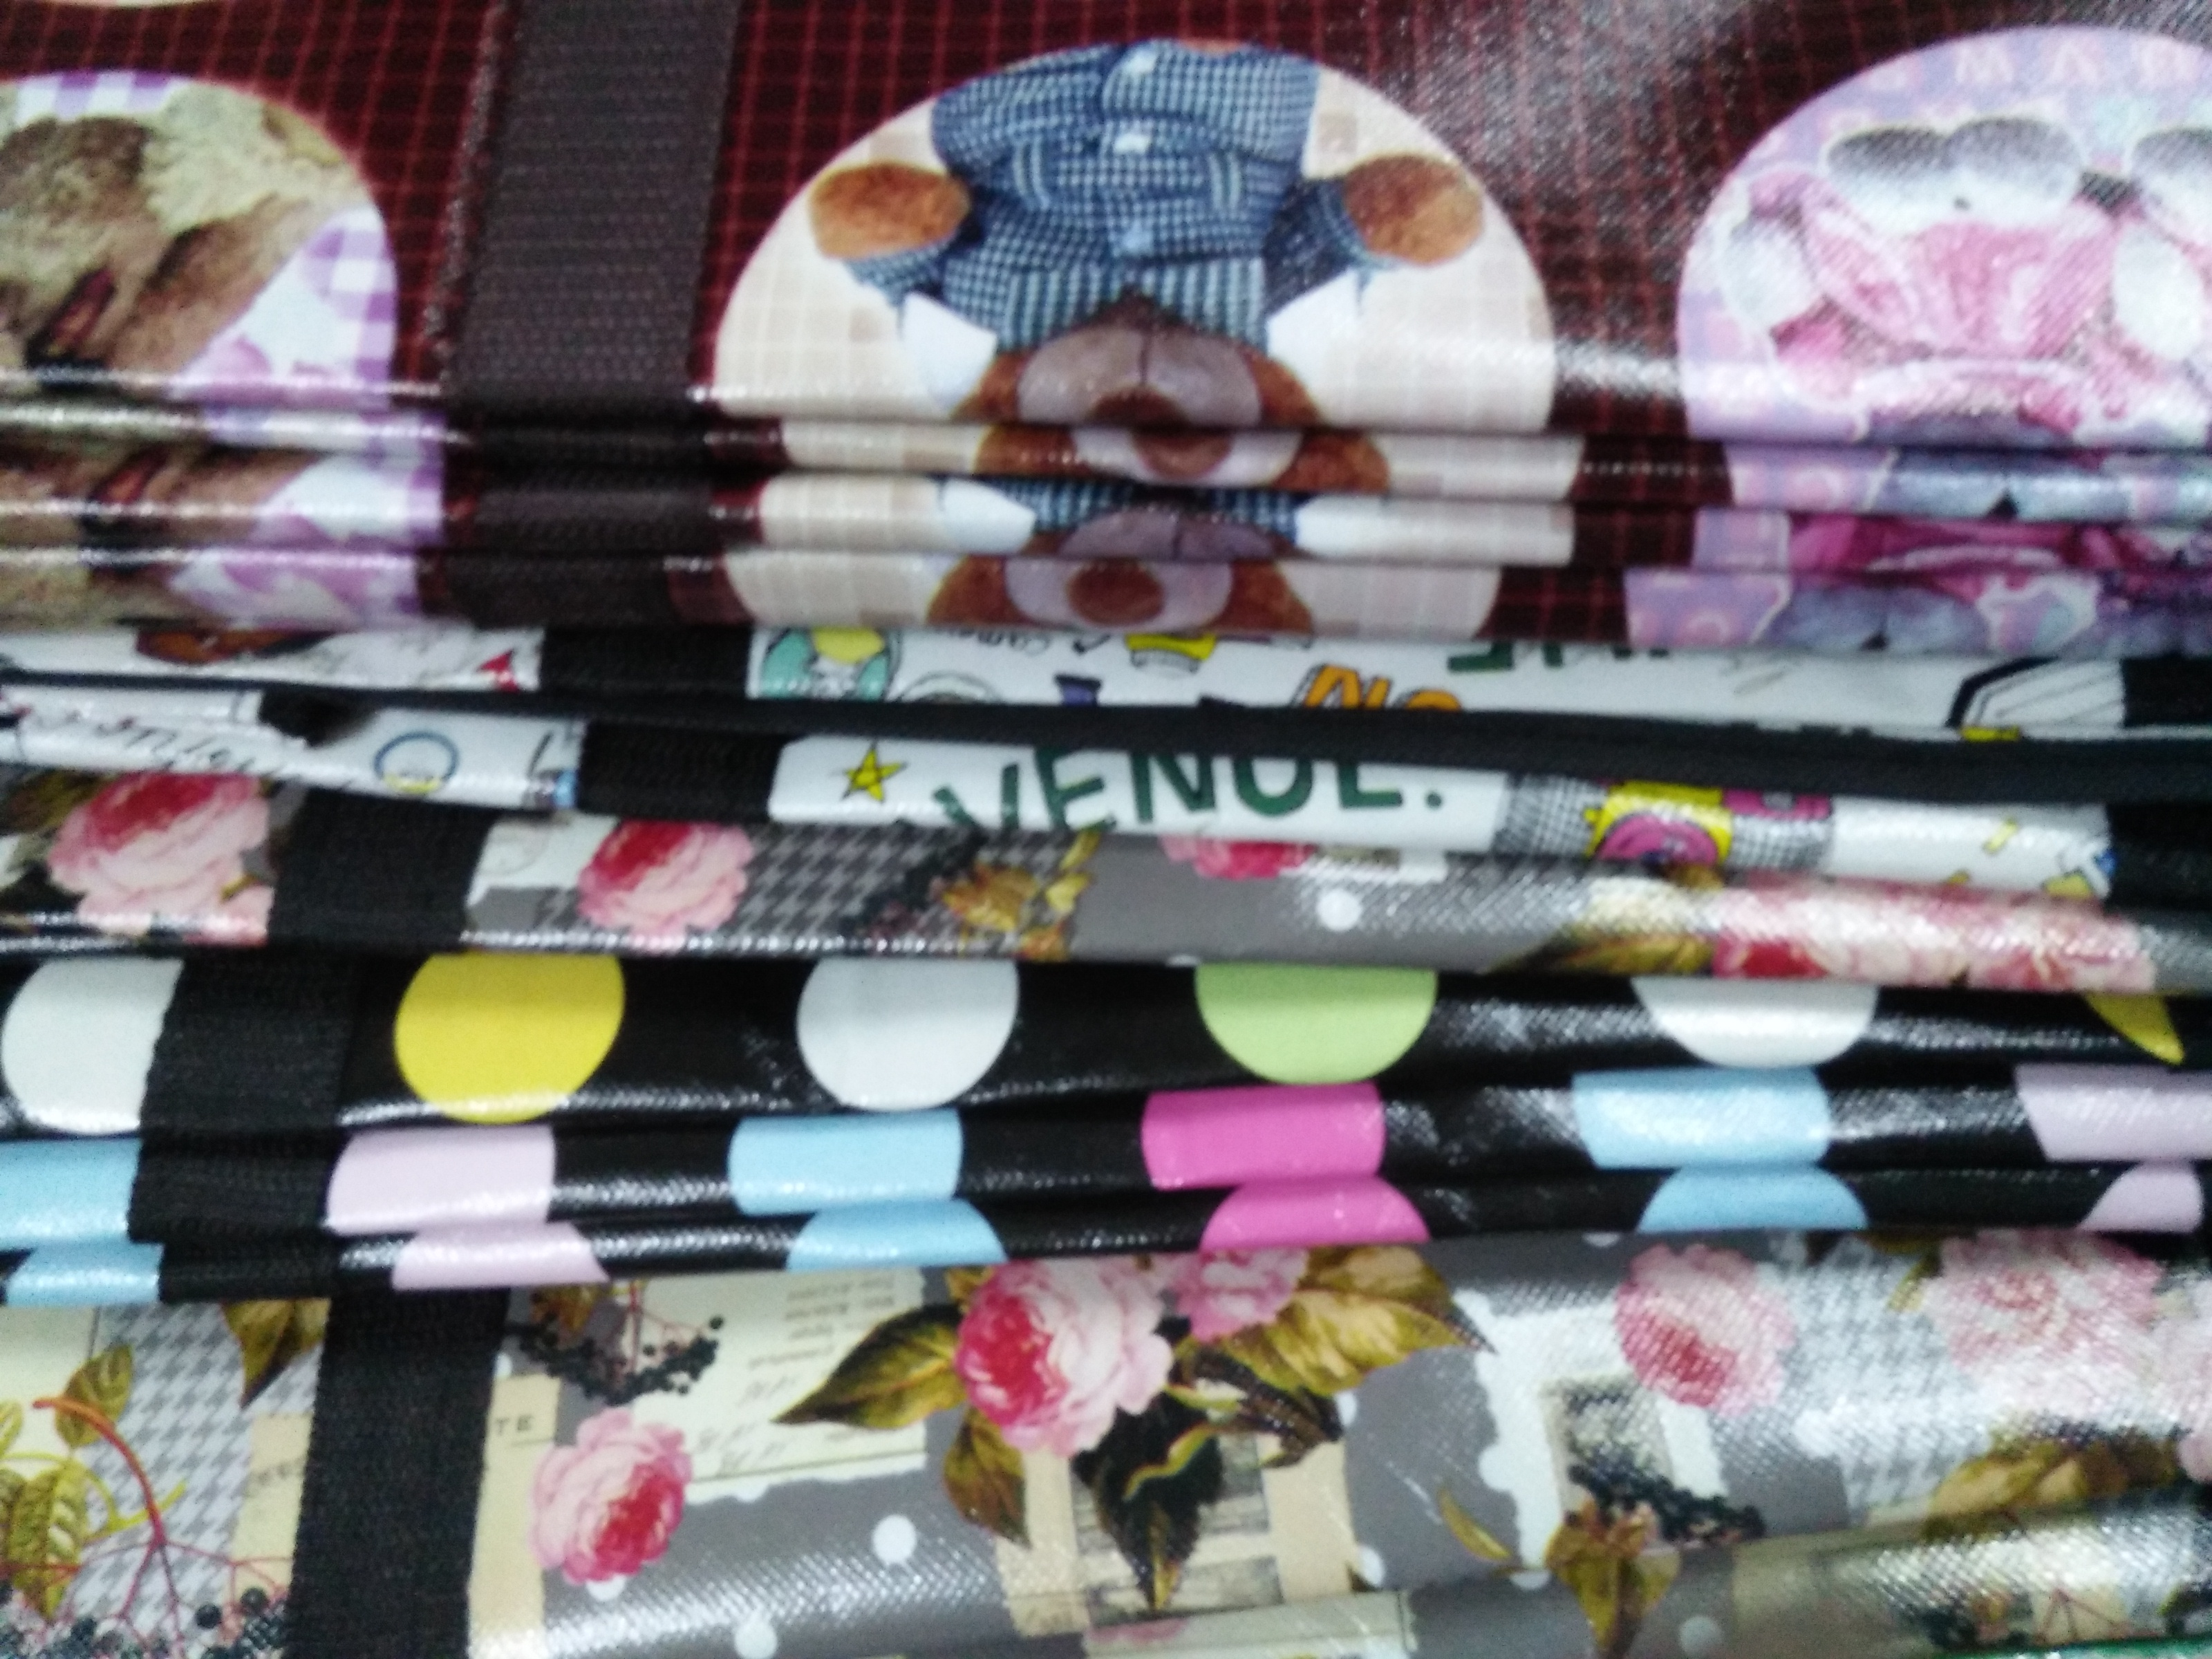 Shopping Bag ถุงลายการ์ตูน ลวดลายน่ารัก บรรจุของได้มาก รับน้ำหนักได้ดี เริ่มต้นที่ 45 บาท